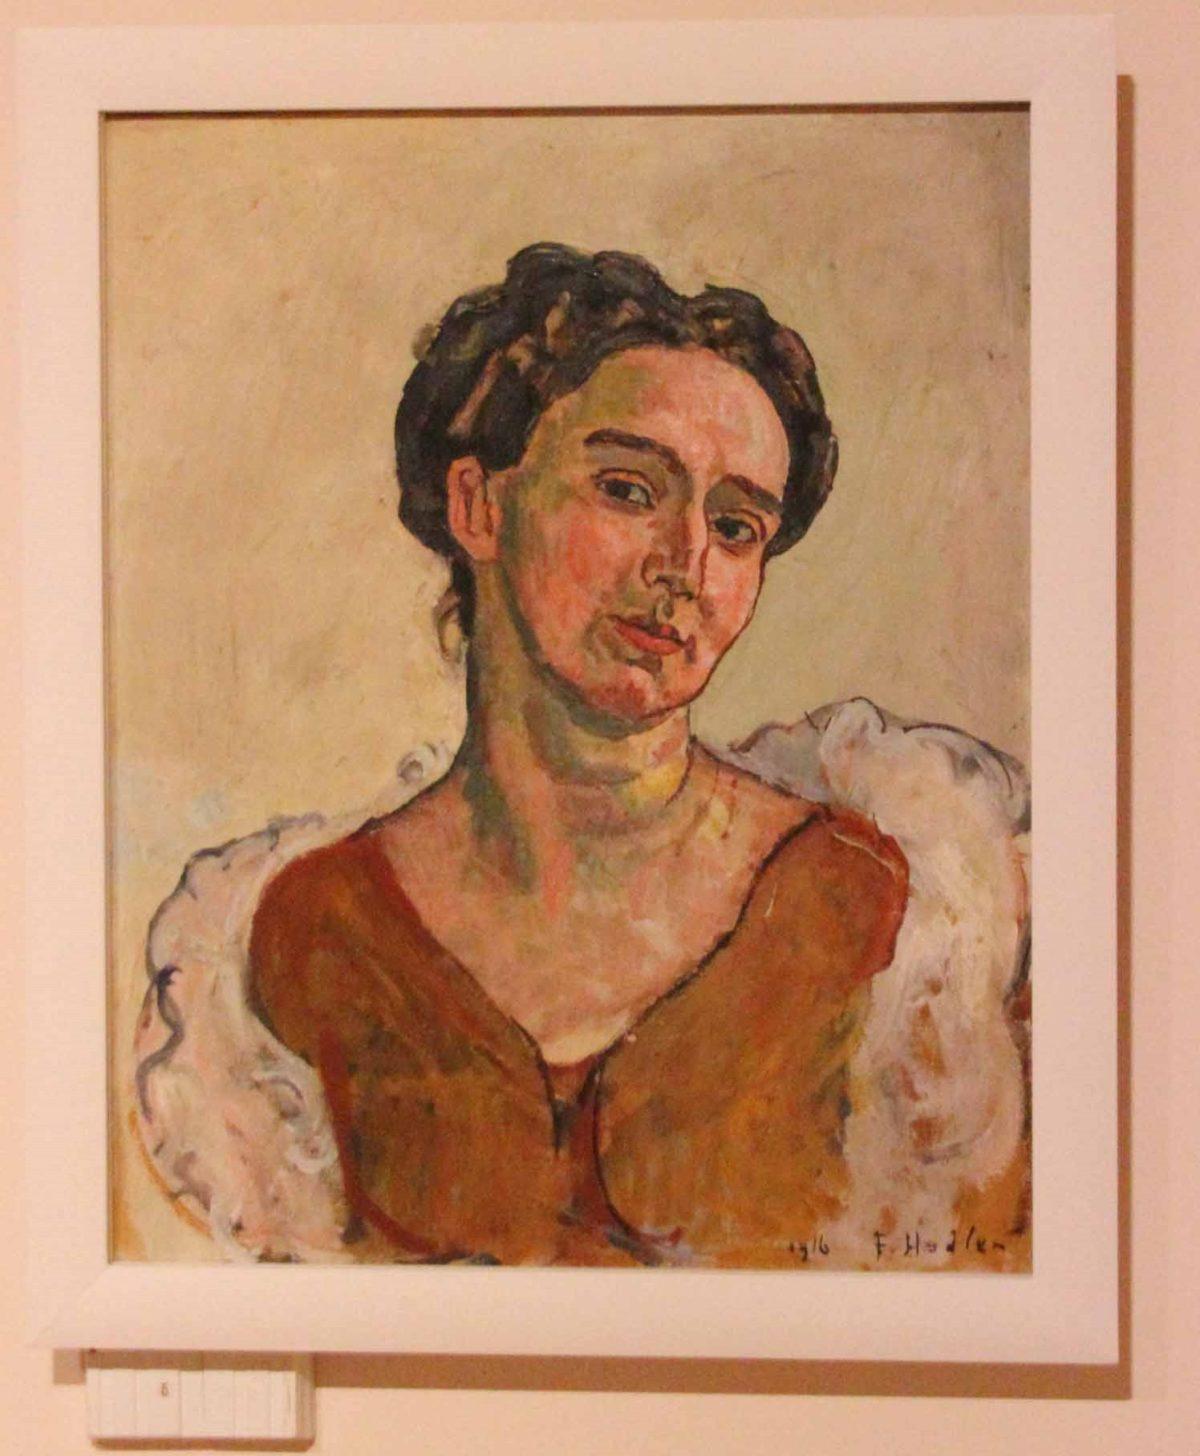 Courbet/Hodler